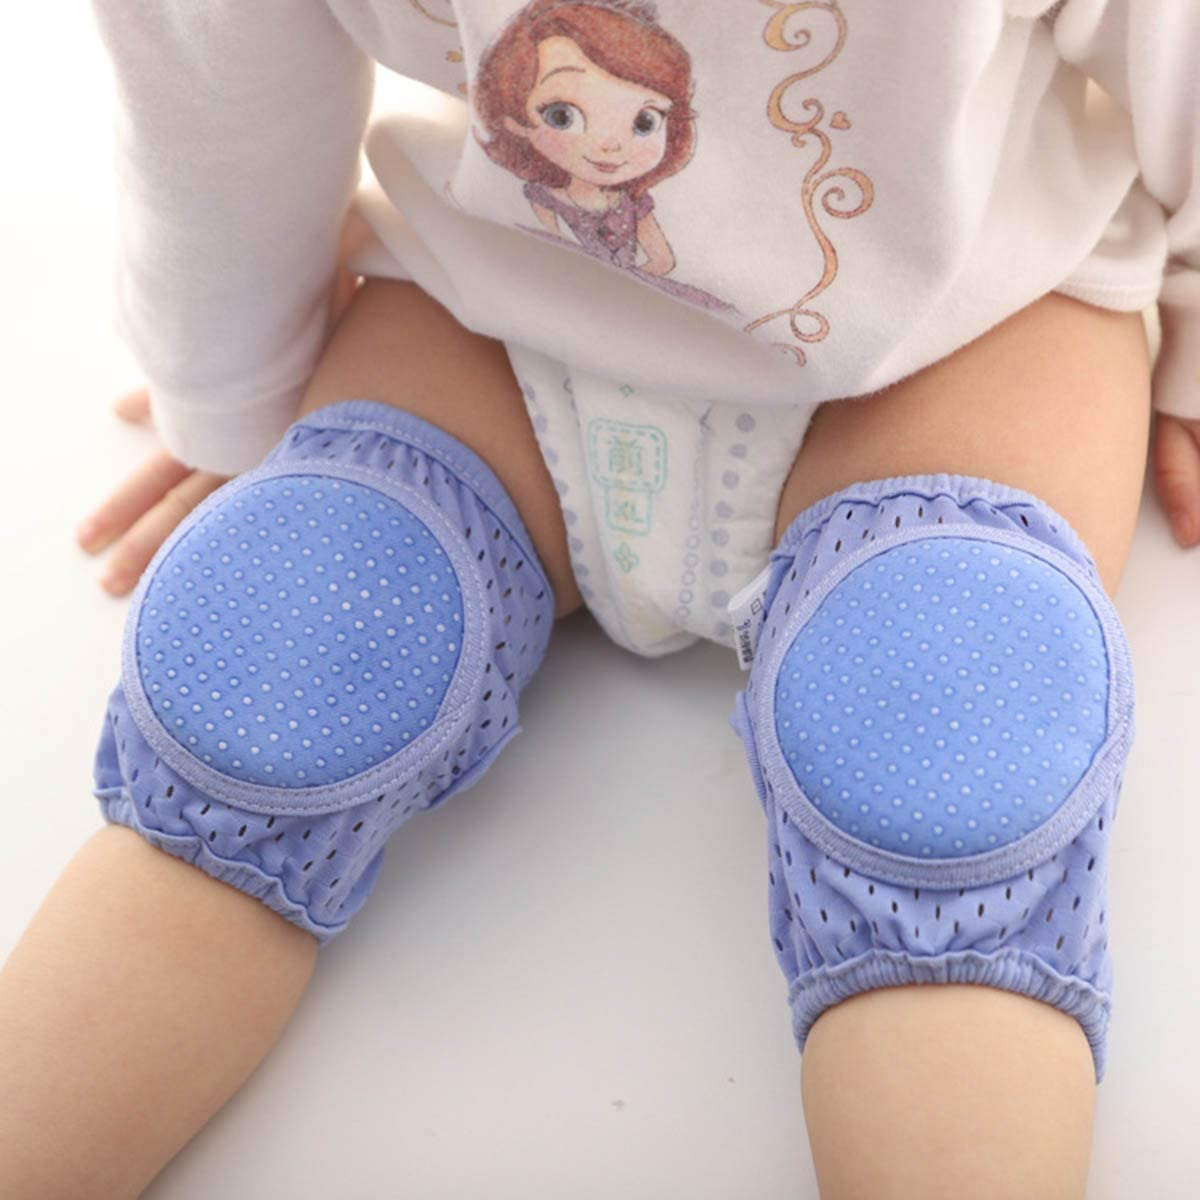 Haokaini 2pair Unisex Adjustable Anti-skid Baby Knees Pads for Crawling